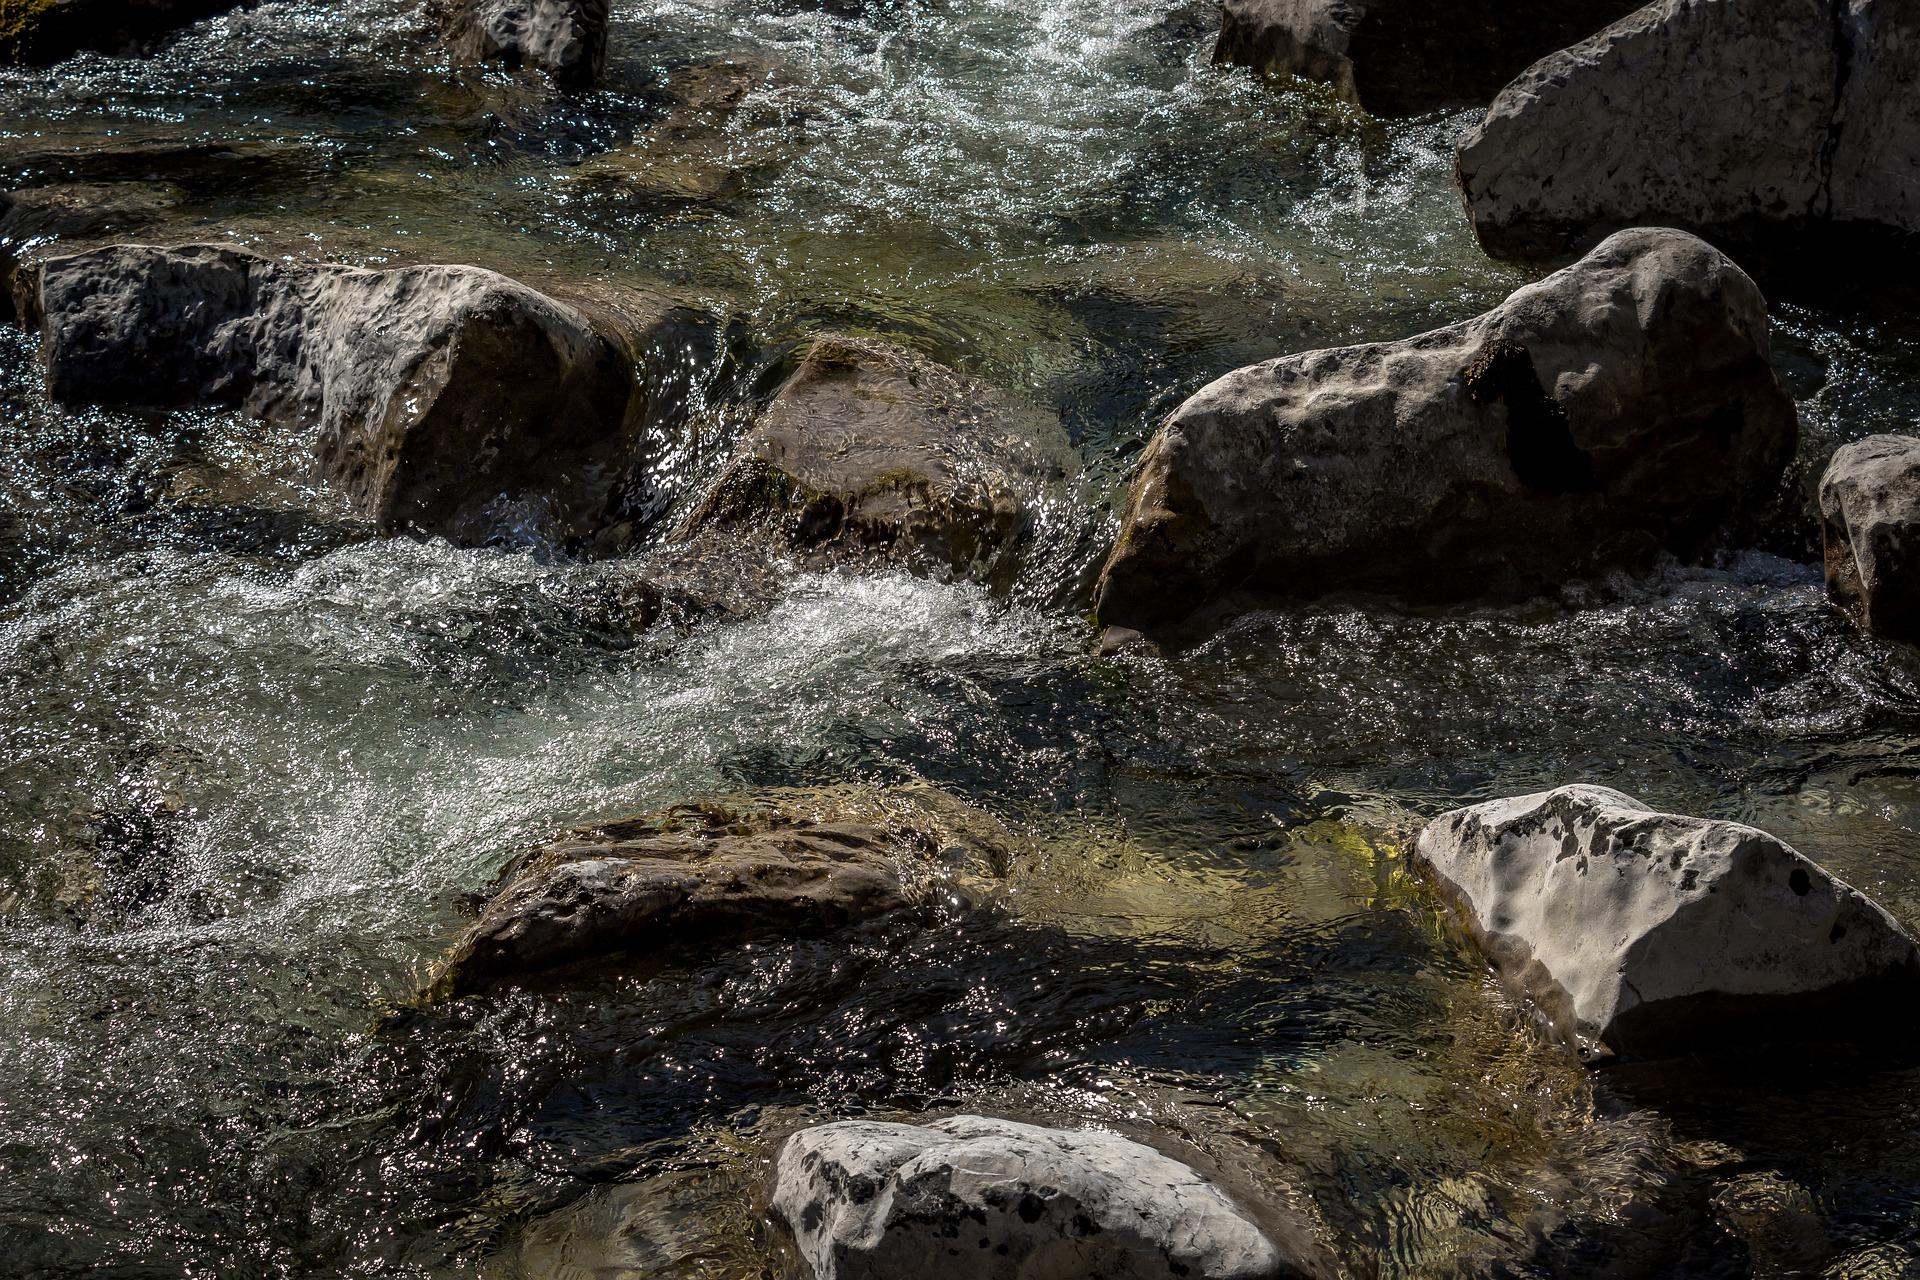 riverbed-5056823_1920.jpg